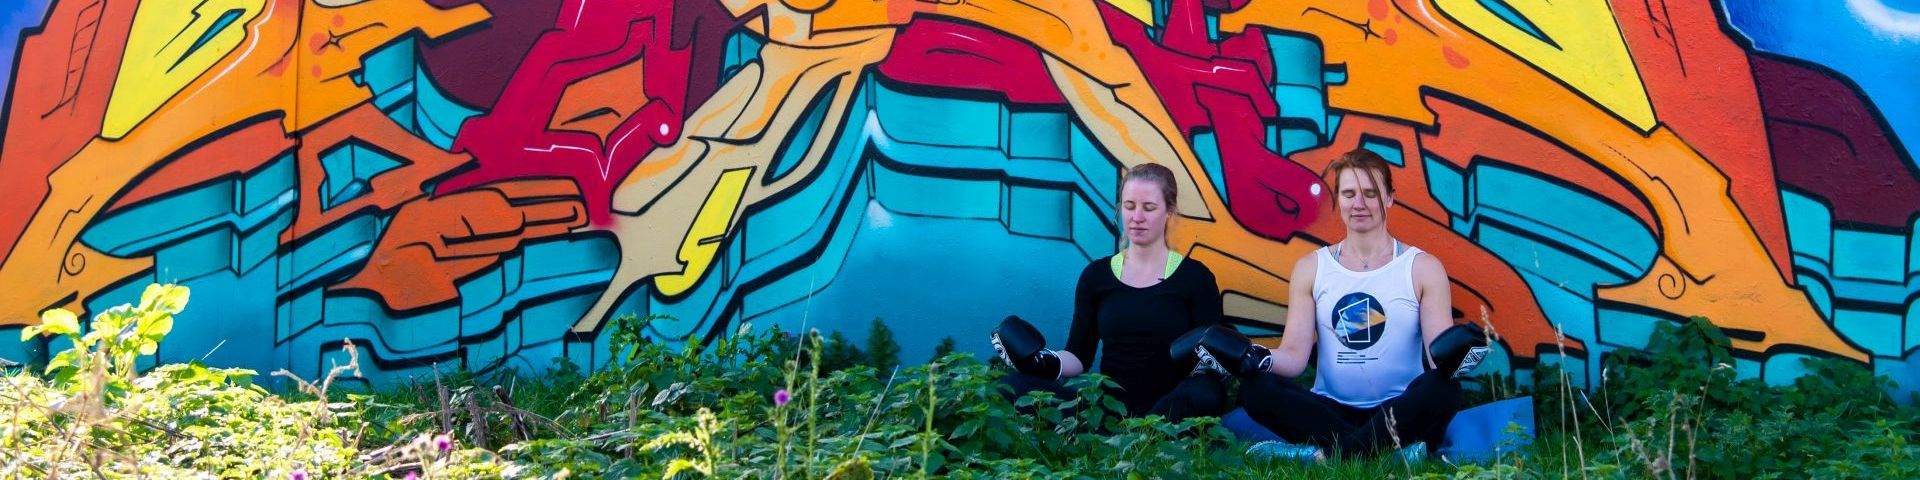 Rooster-tarieven - Banner_Leefstijlcoach-Wageningen-Ede-Bennekom-yoga-coaching-personal-training_DSC_3751-Copy